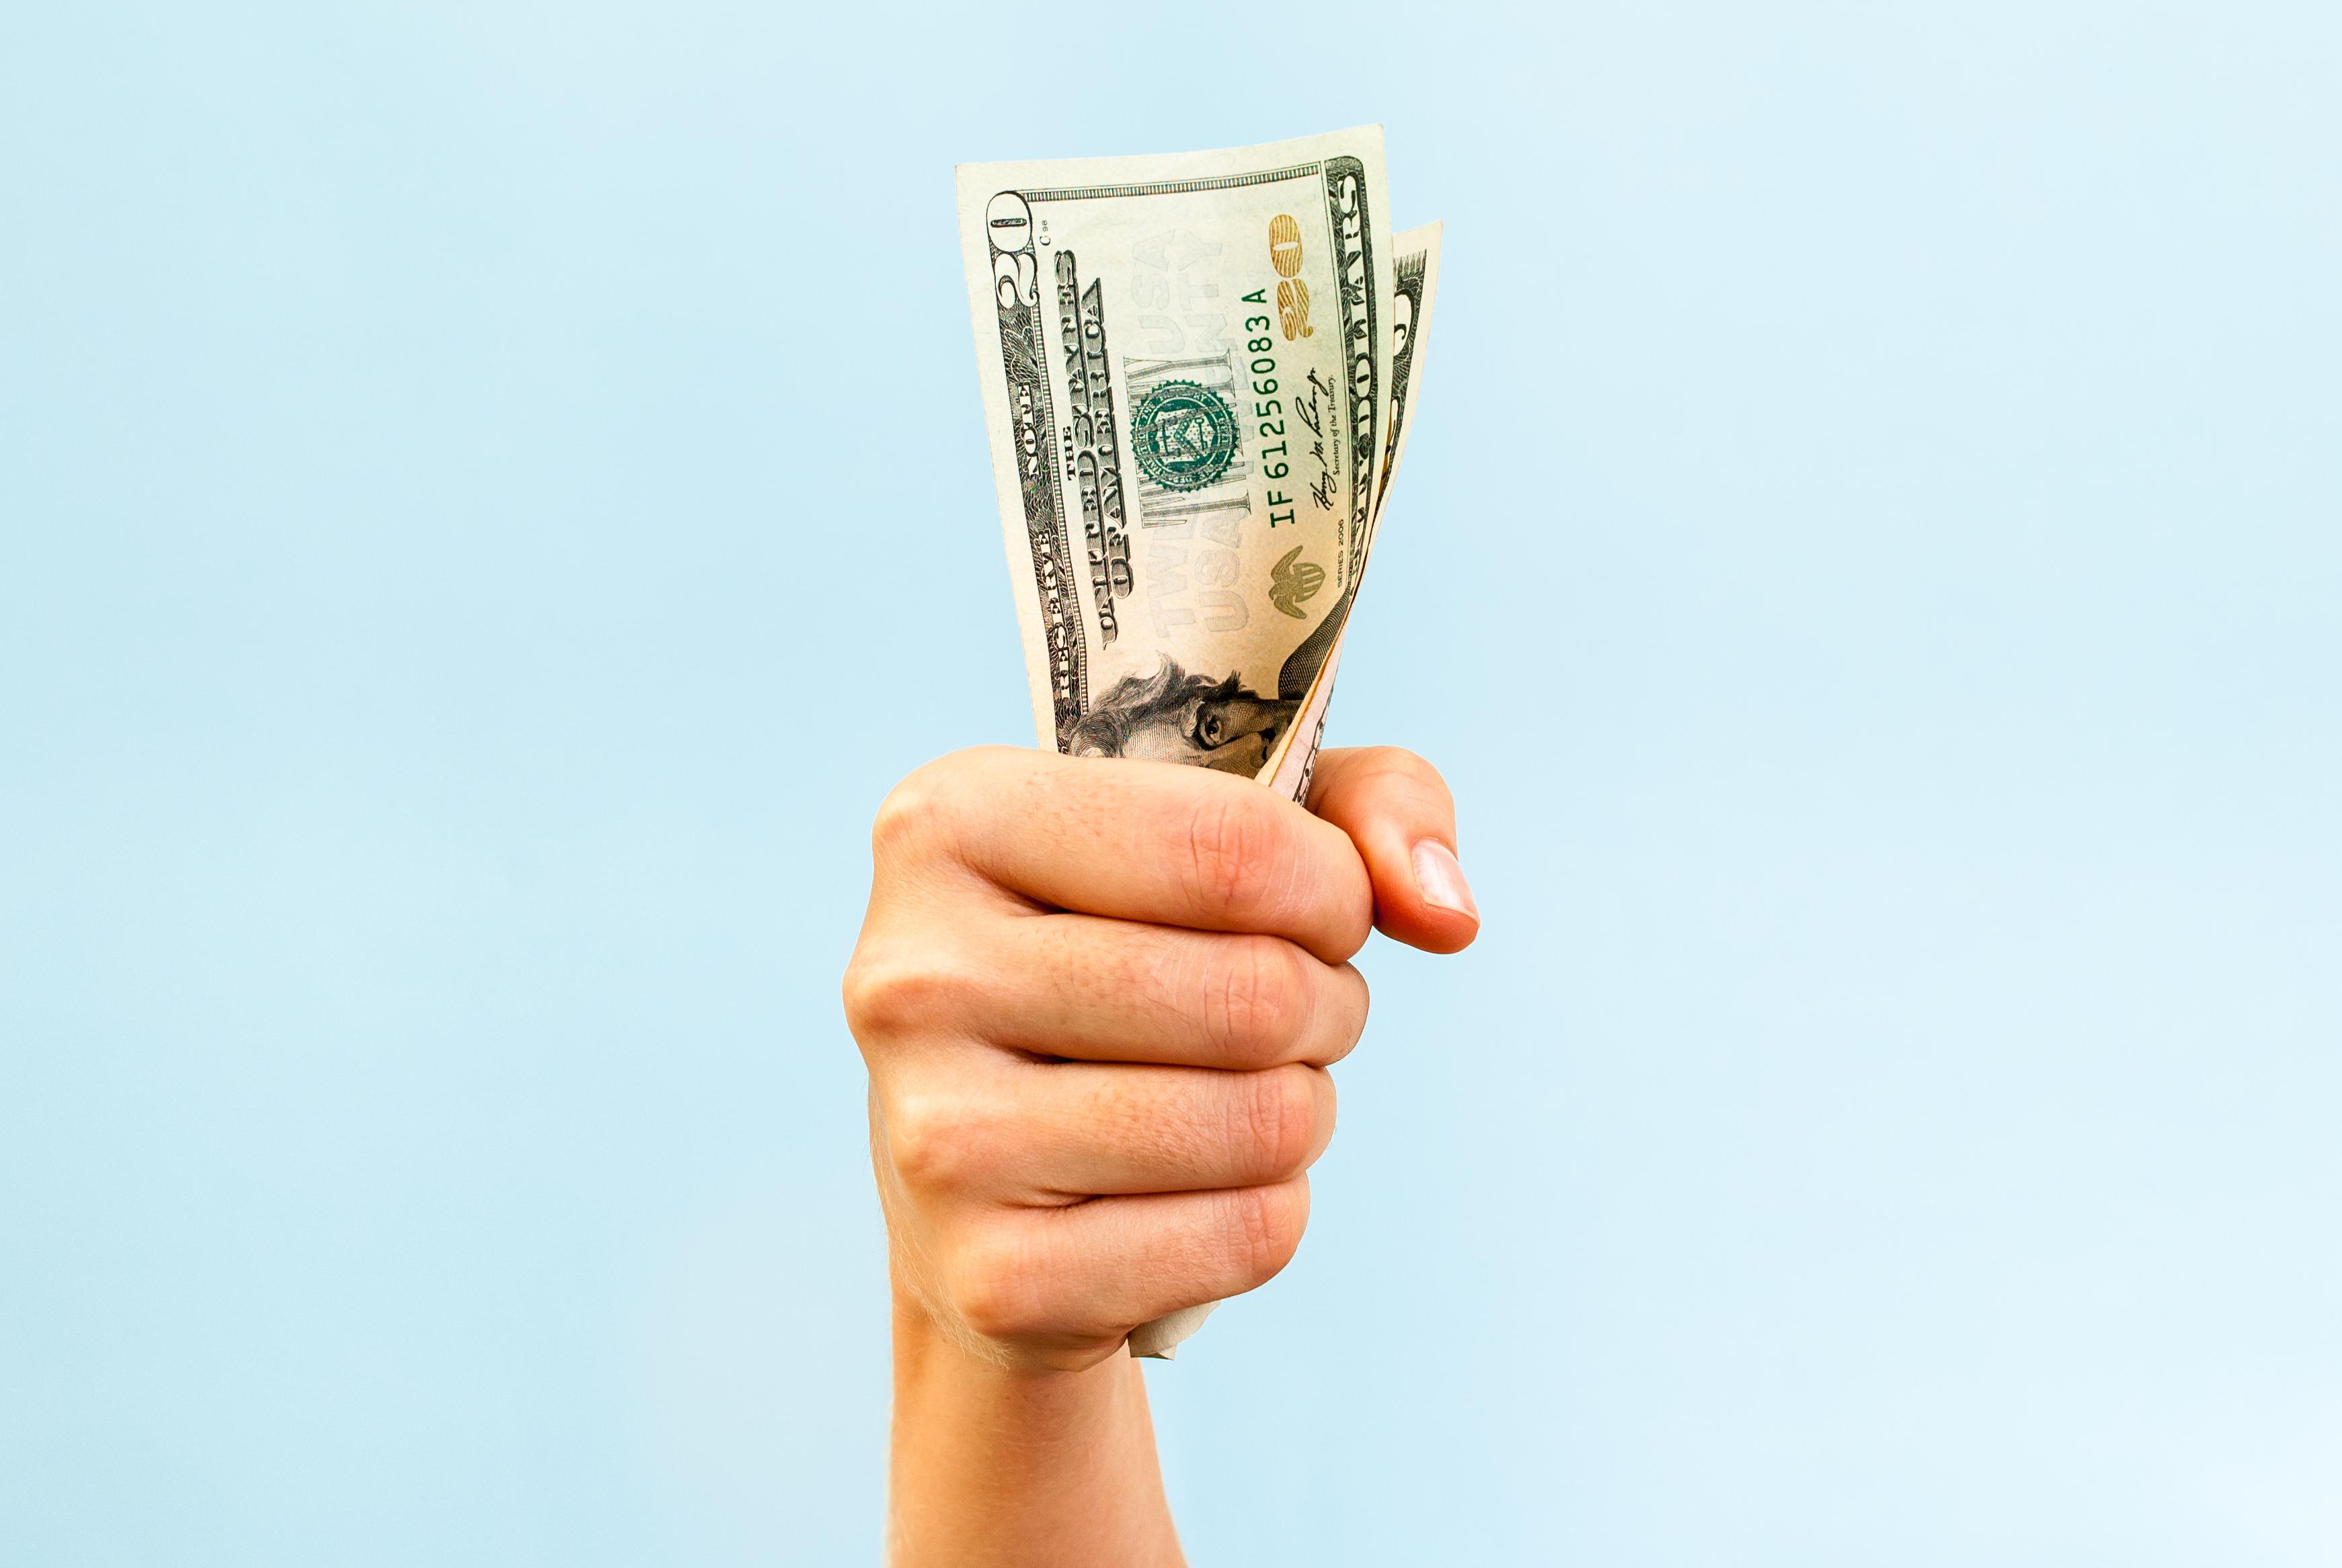 IVP announces $1.5 billion venture fund